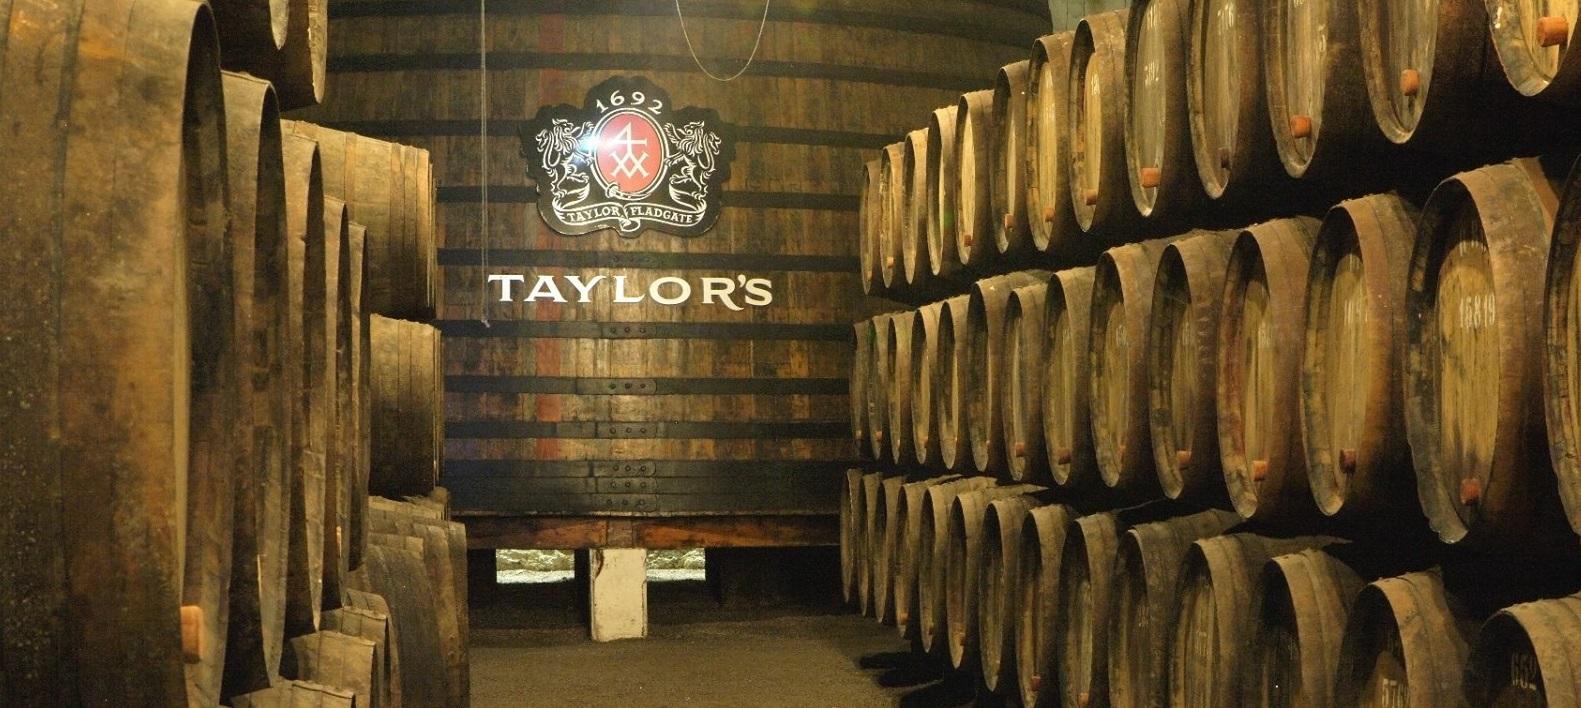 Caves Taylor's – Visita & Cata Signature